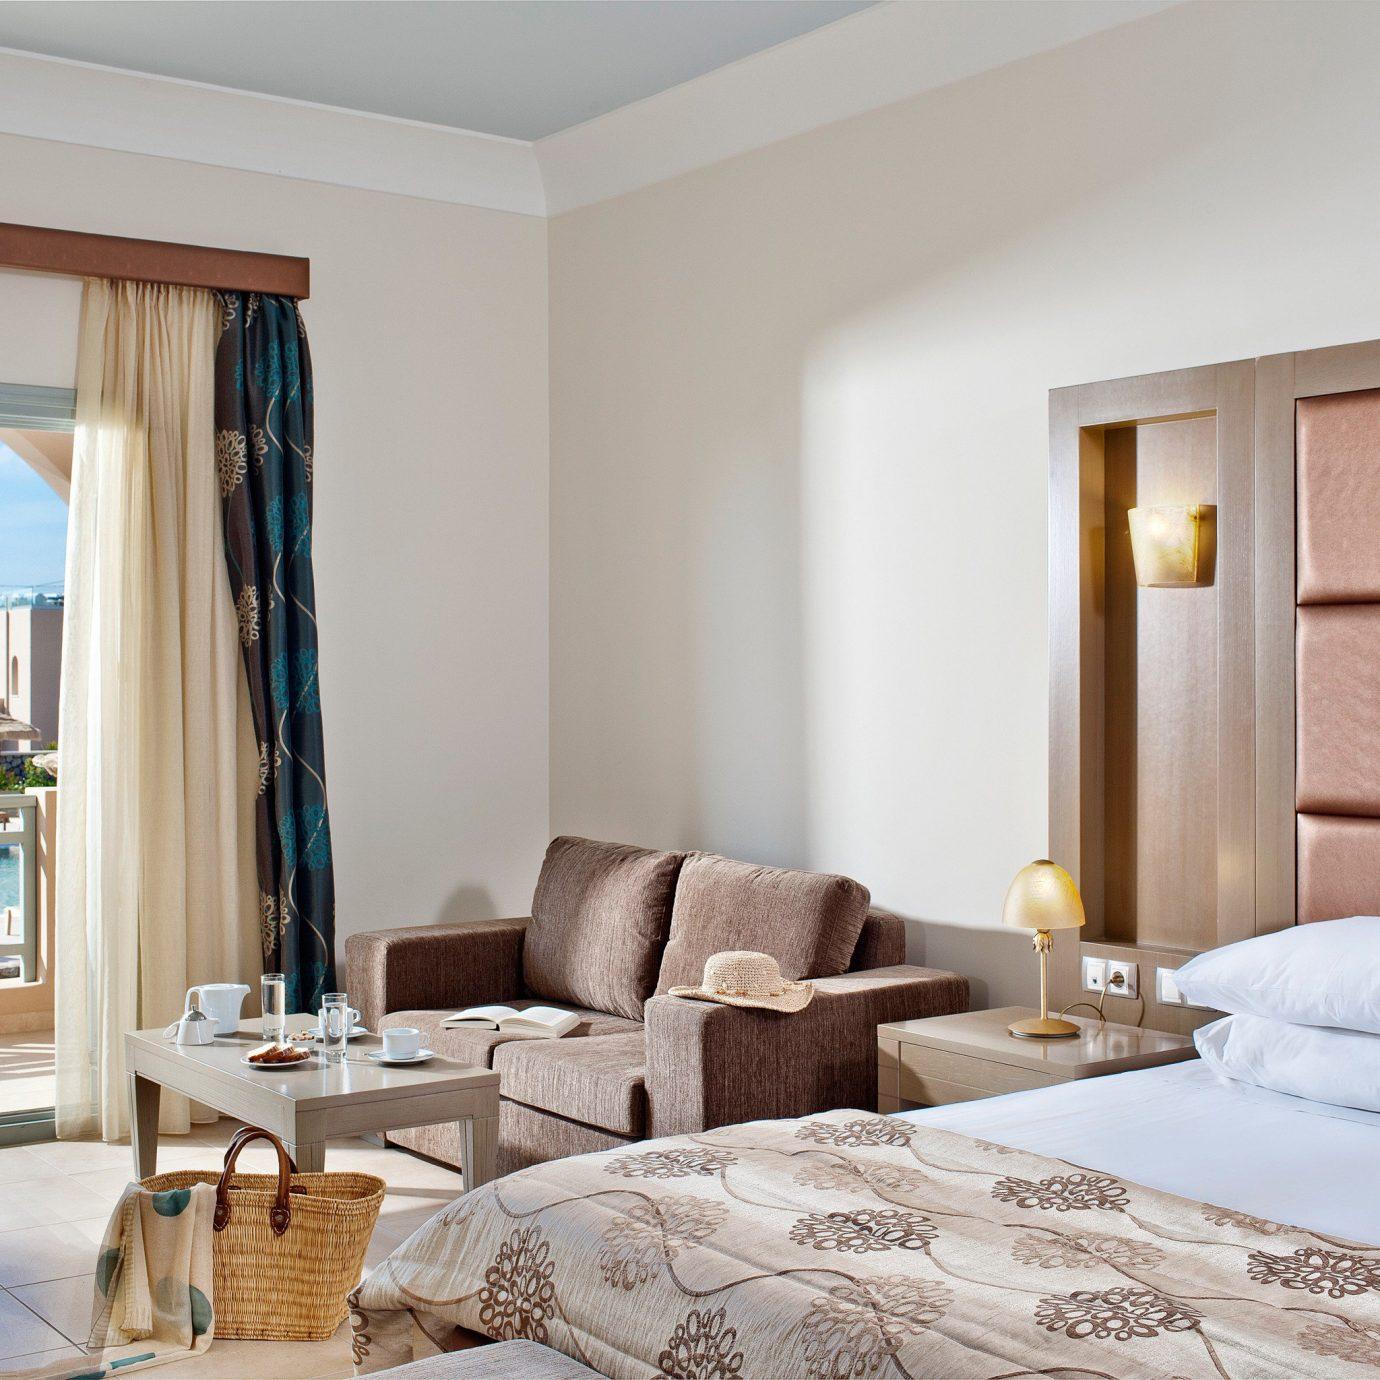 property Bedroom living room home Suite cottage condominium Villa containing